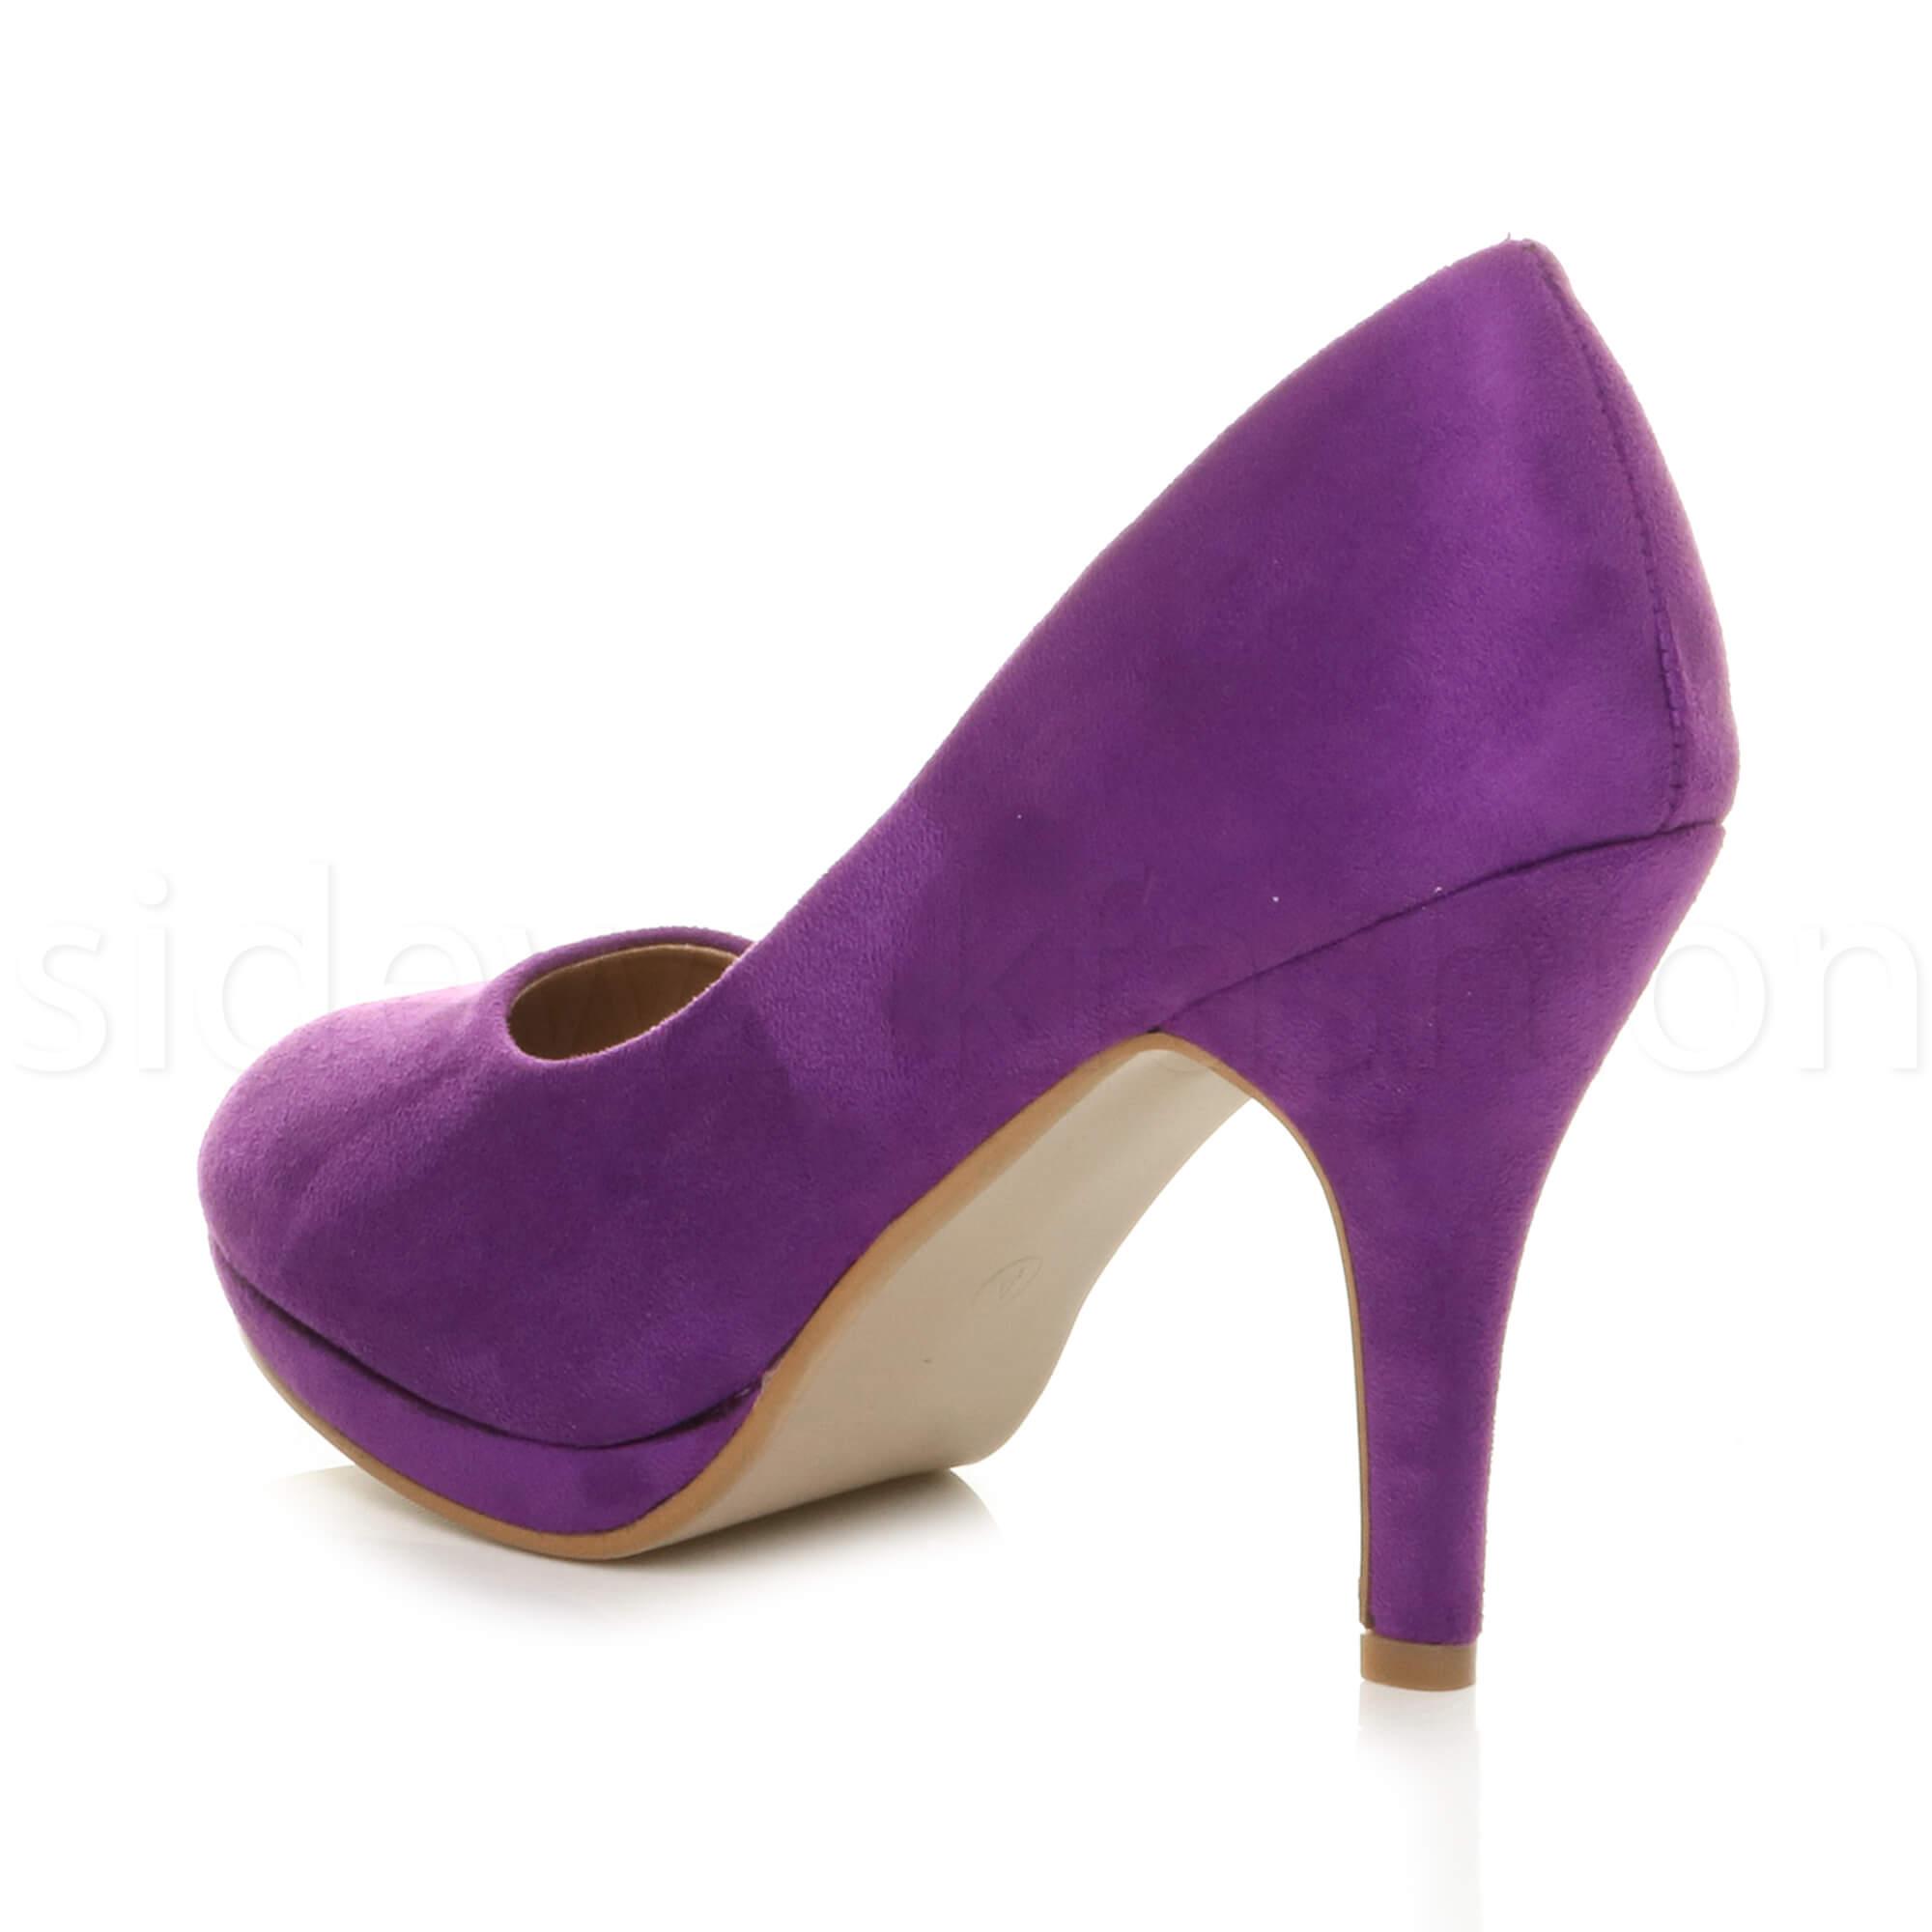 Womens-ladies-high-mid-heel-platform-wedding-evening-bridesmaid-court-shoes-size thumbnail 138